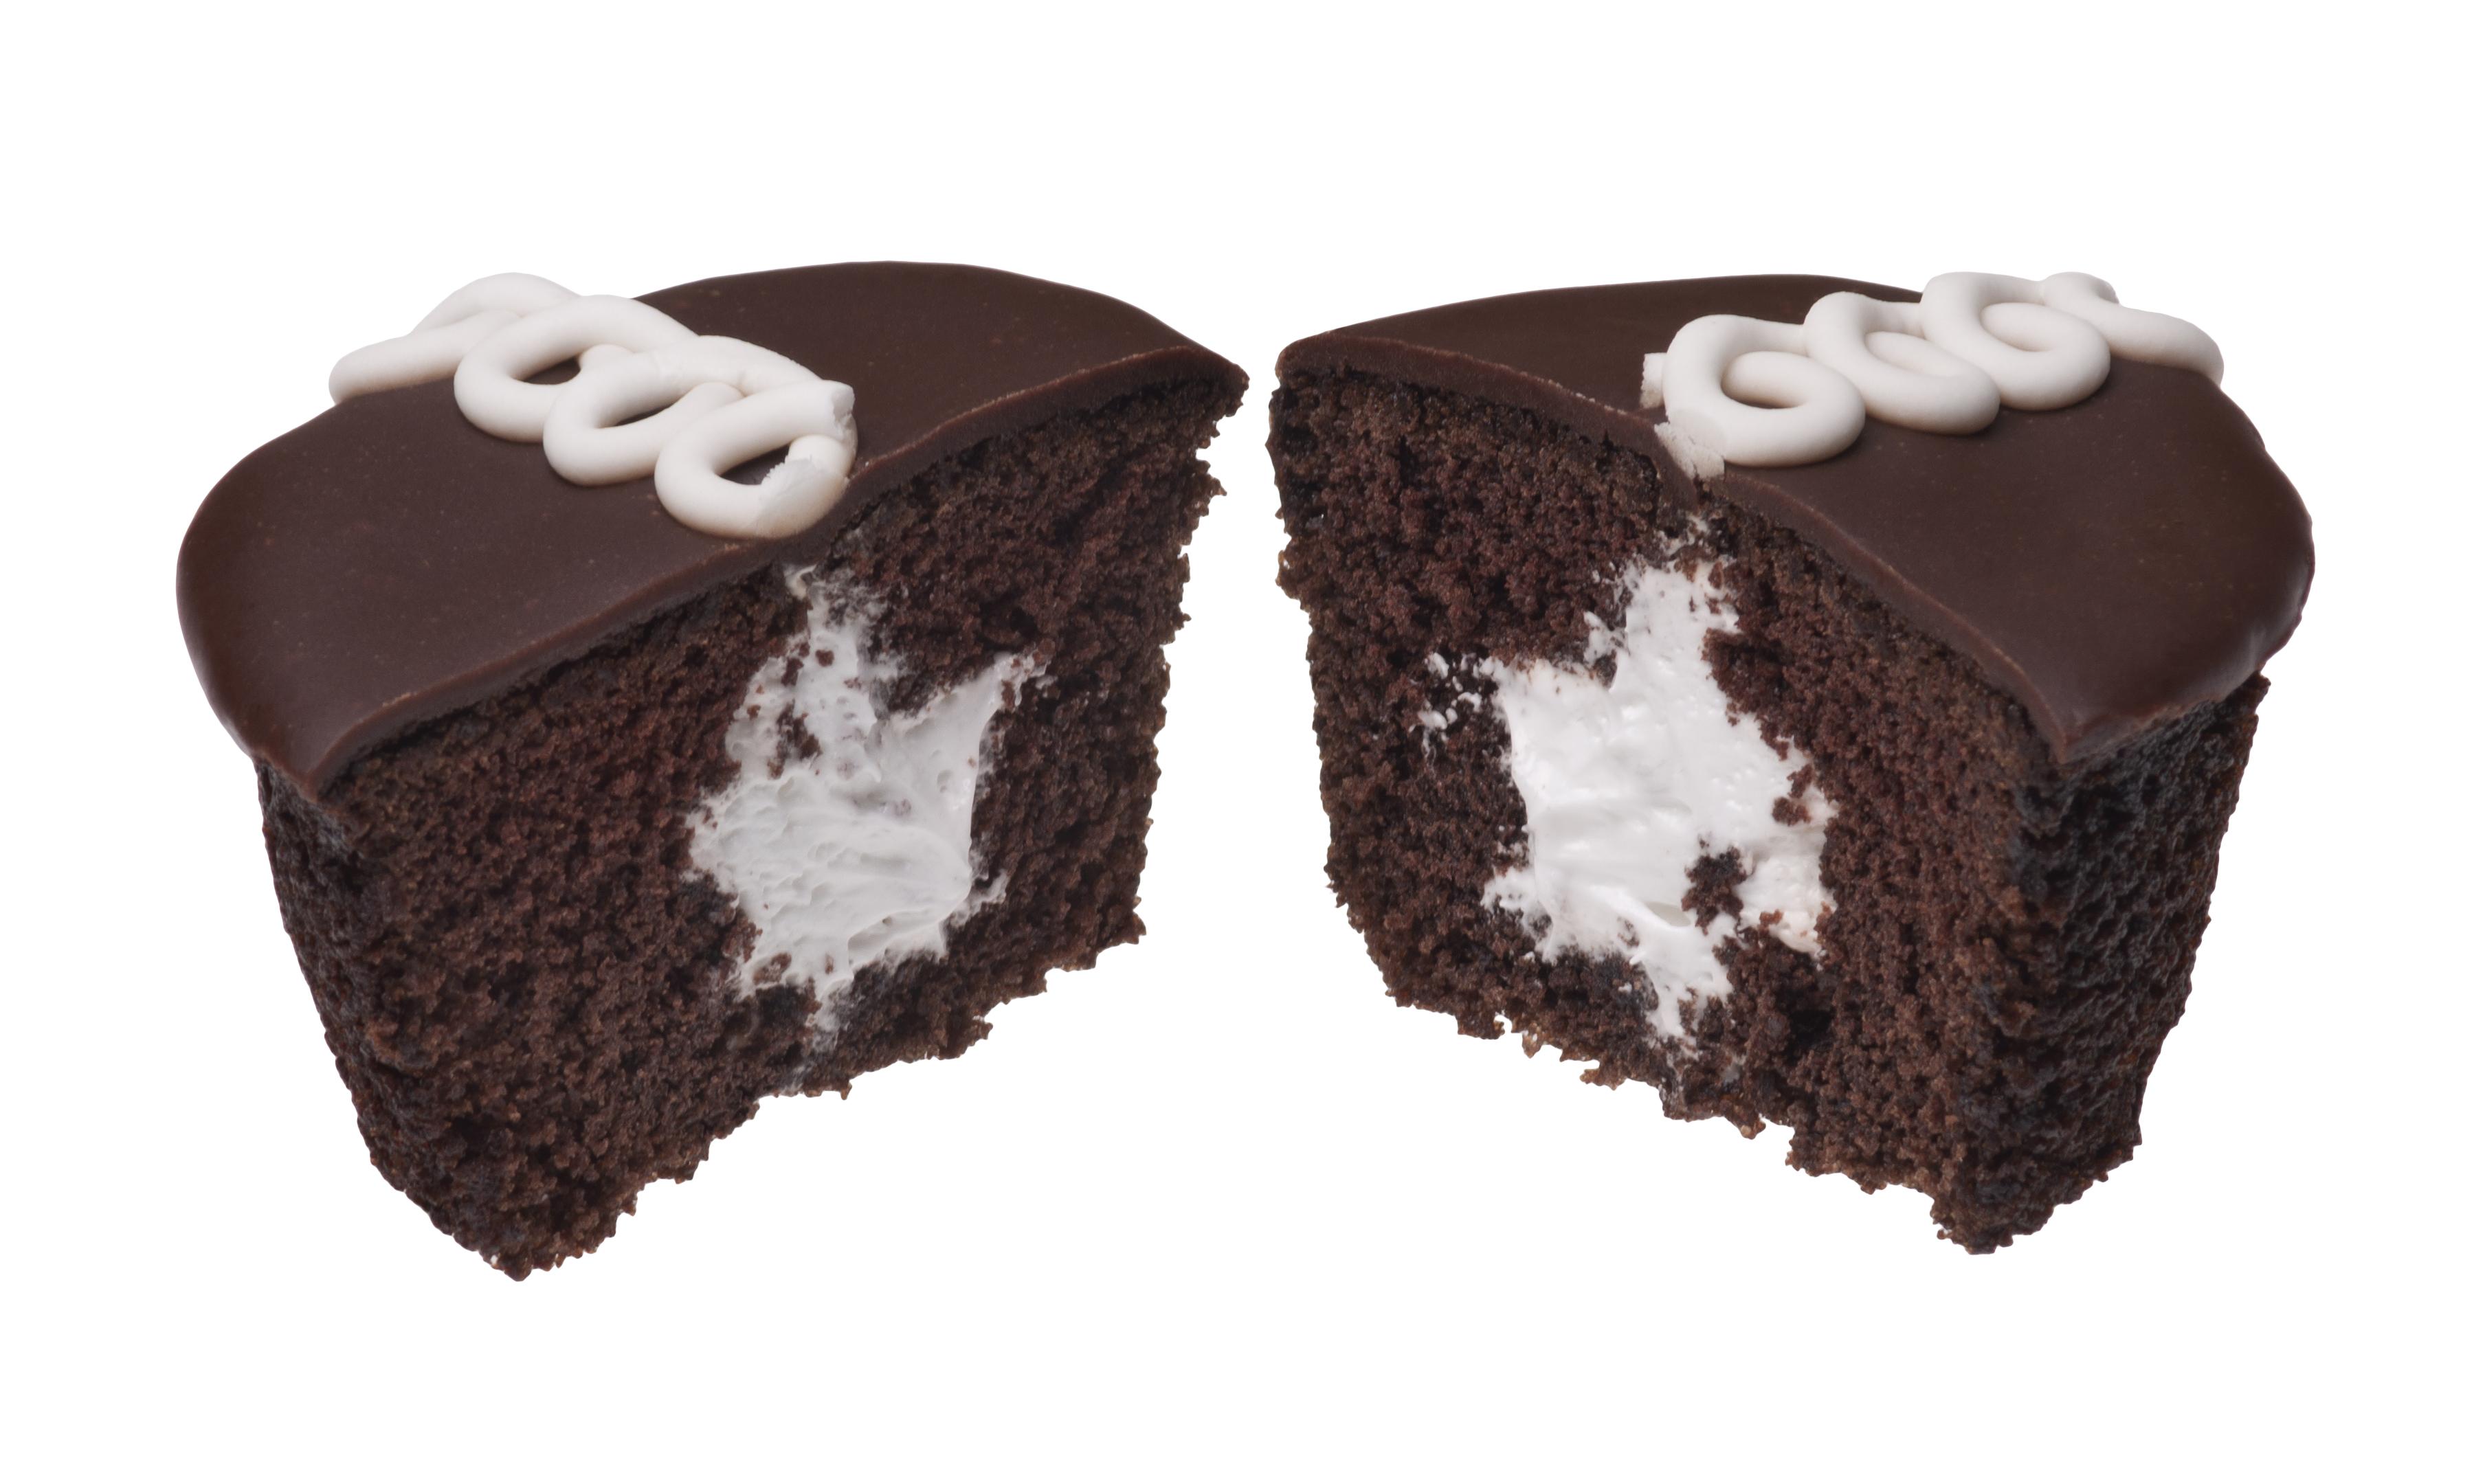 Split Cream Filled Brioche Cake Streusel Topped